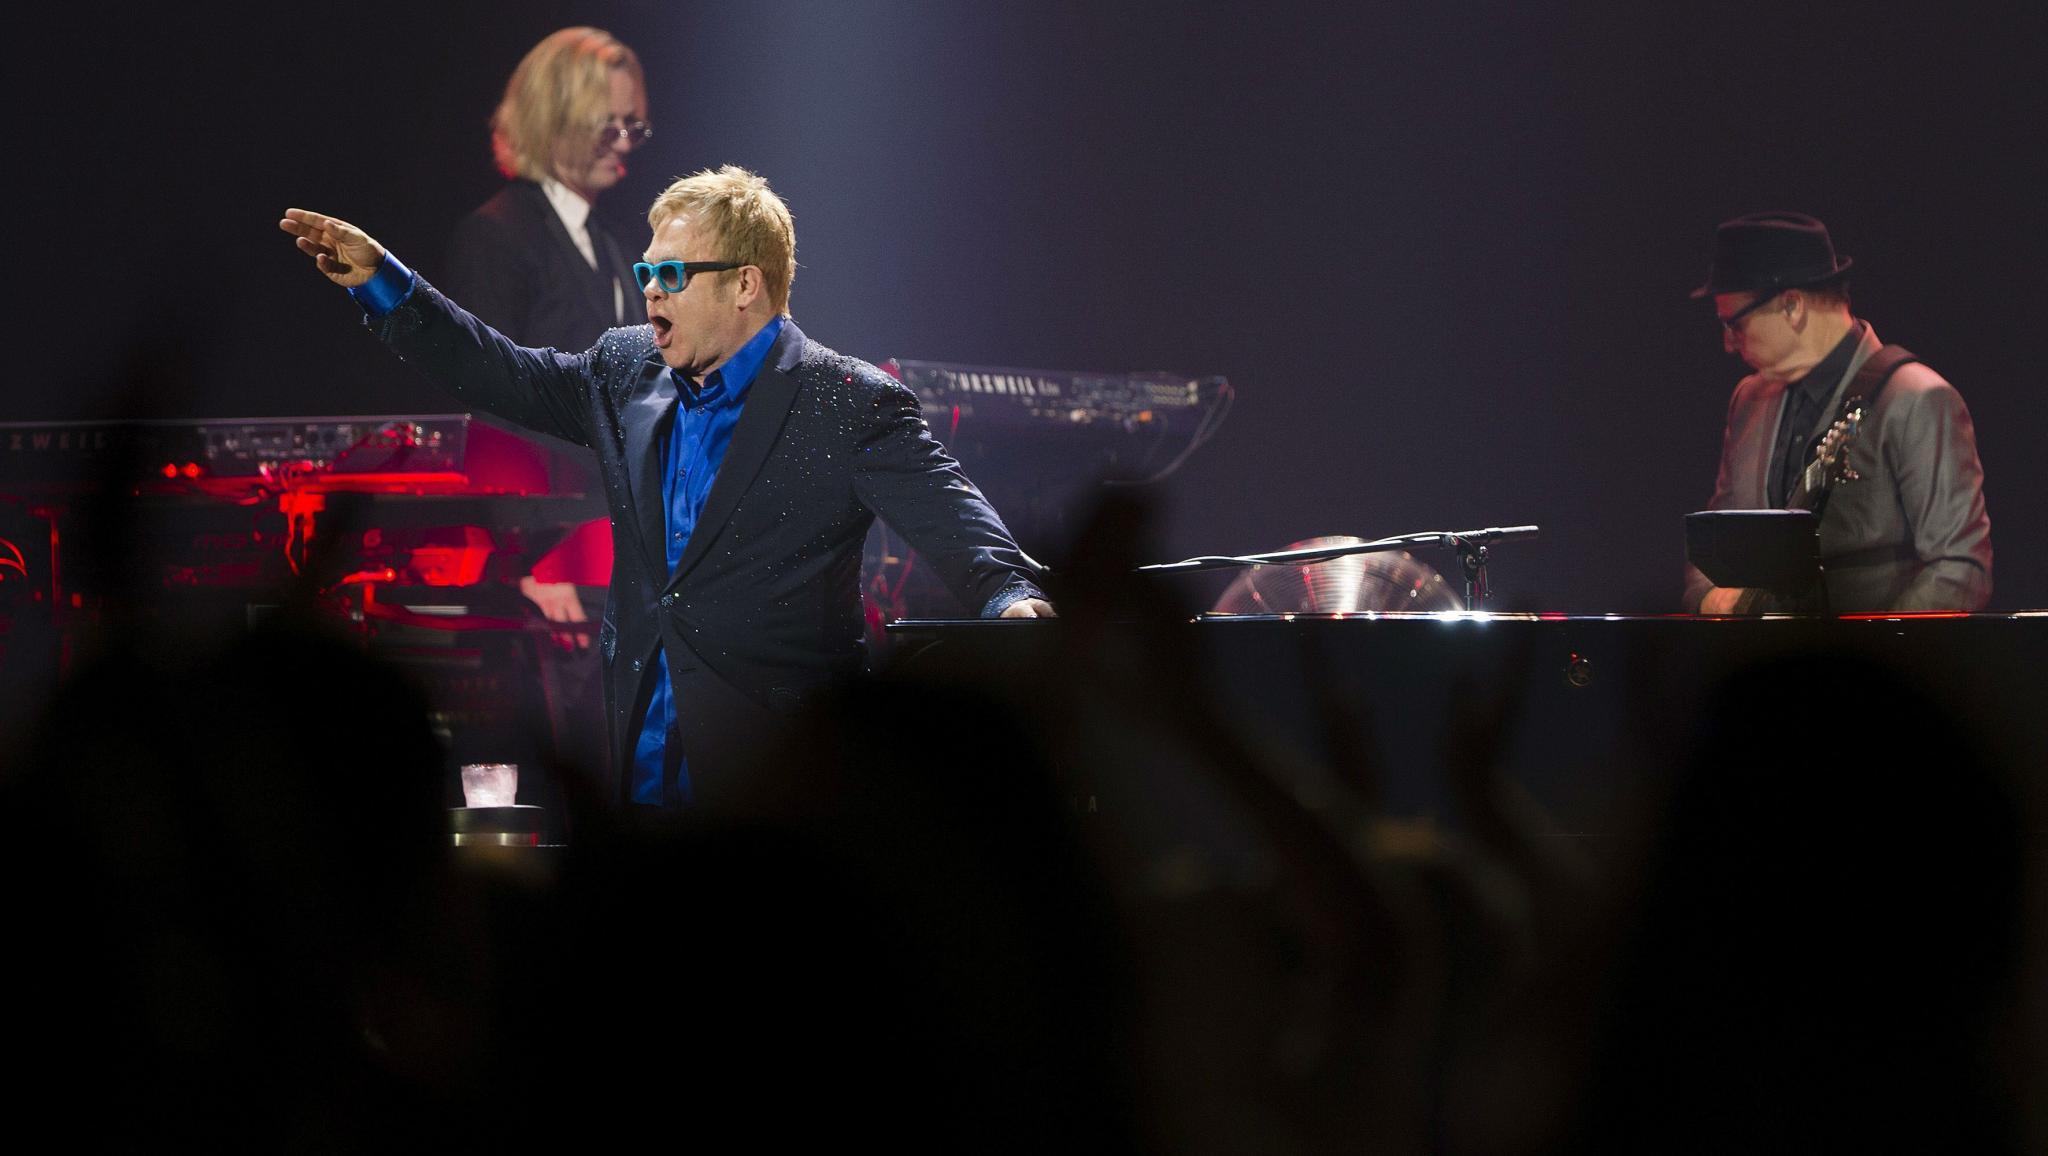 Elton John Calls Michael Jackson 'Mentally Ill' in Upcoming Memoir